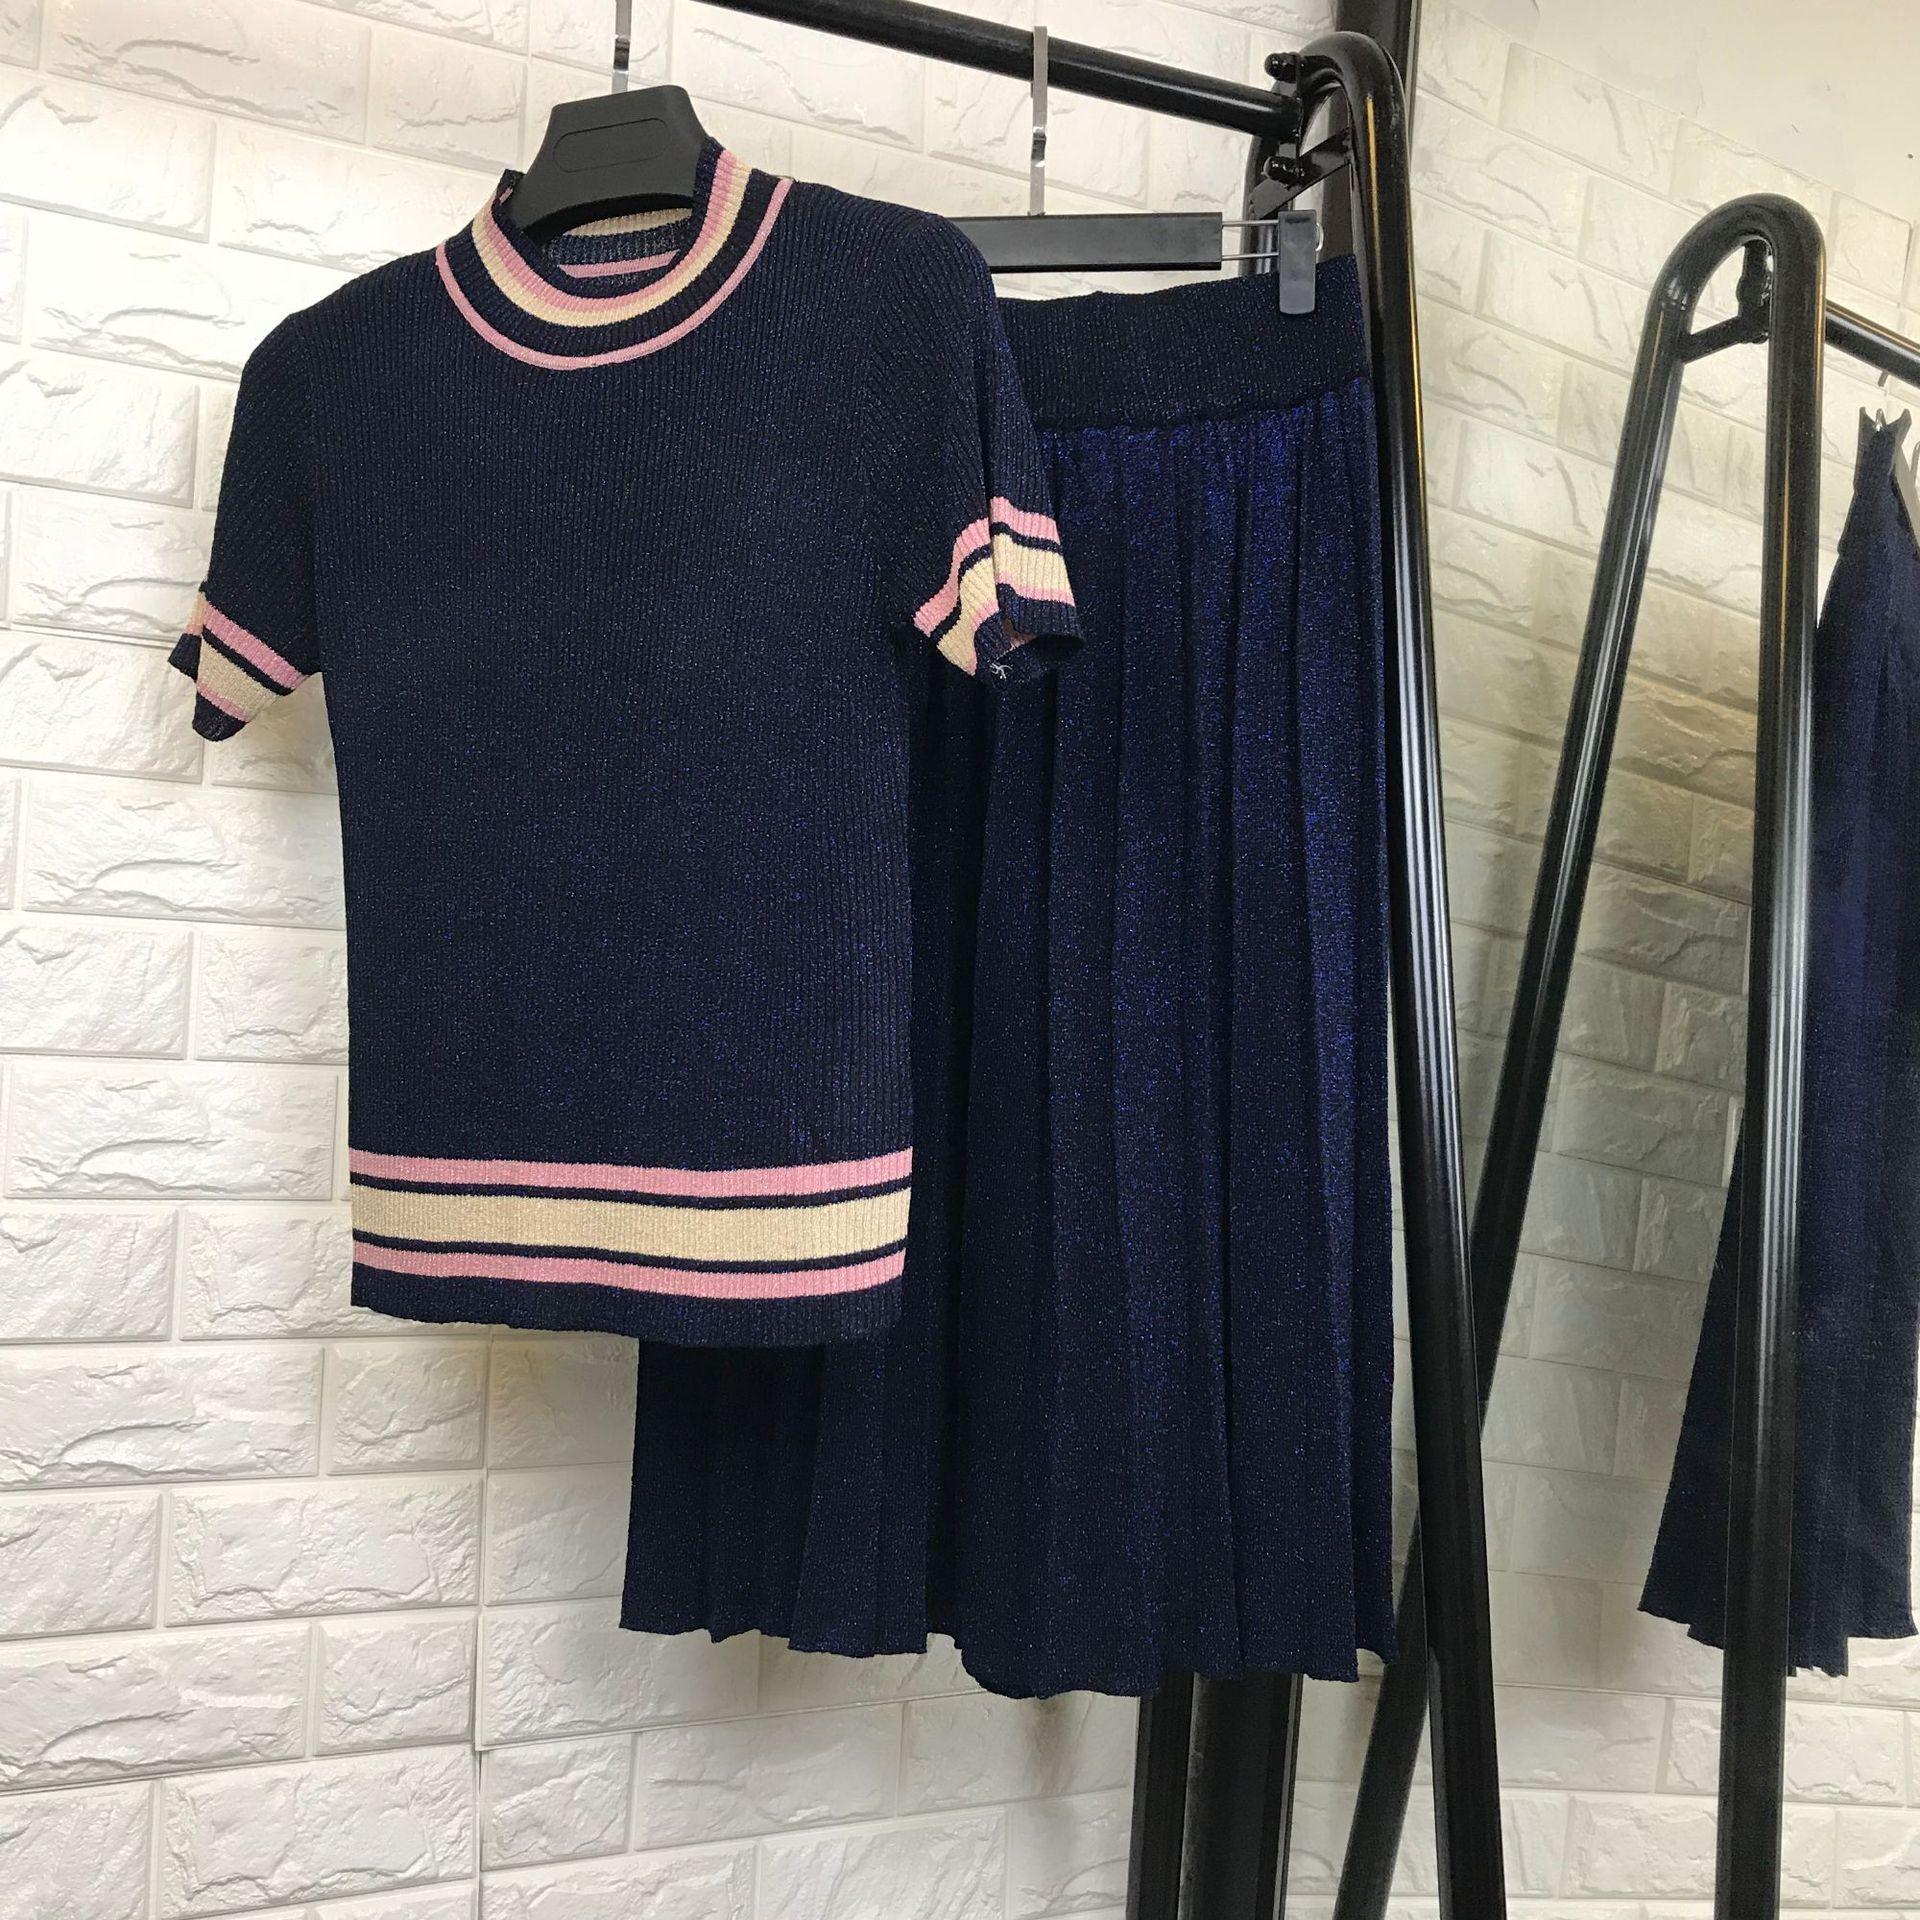 Women elegant fashion short sleeve striped hem knit sweater tops + pleated long skirt 2 piece set new 2018 summer fashion blue